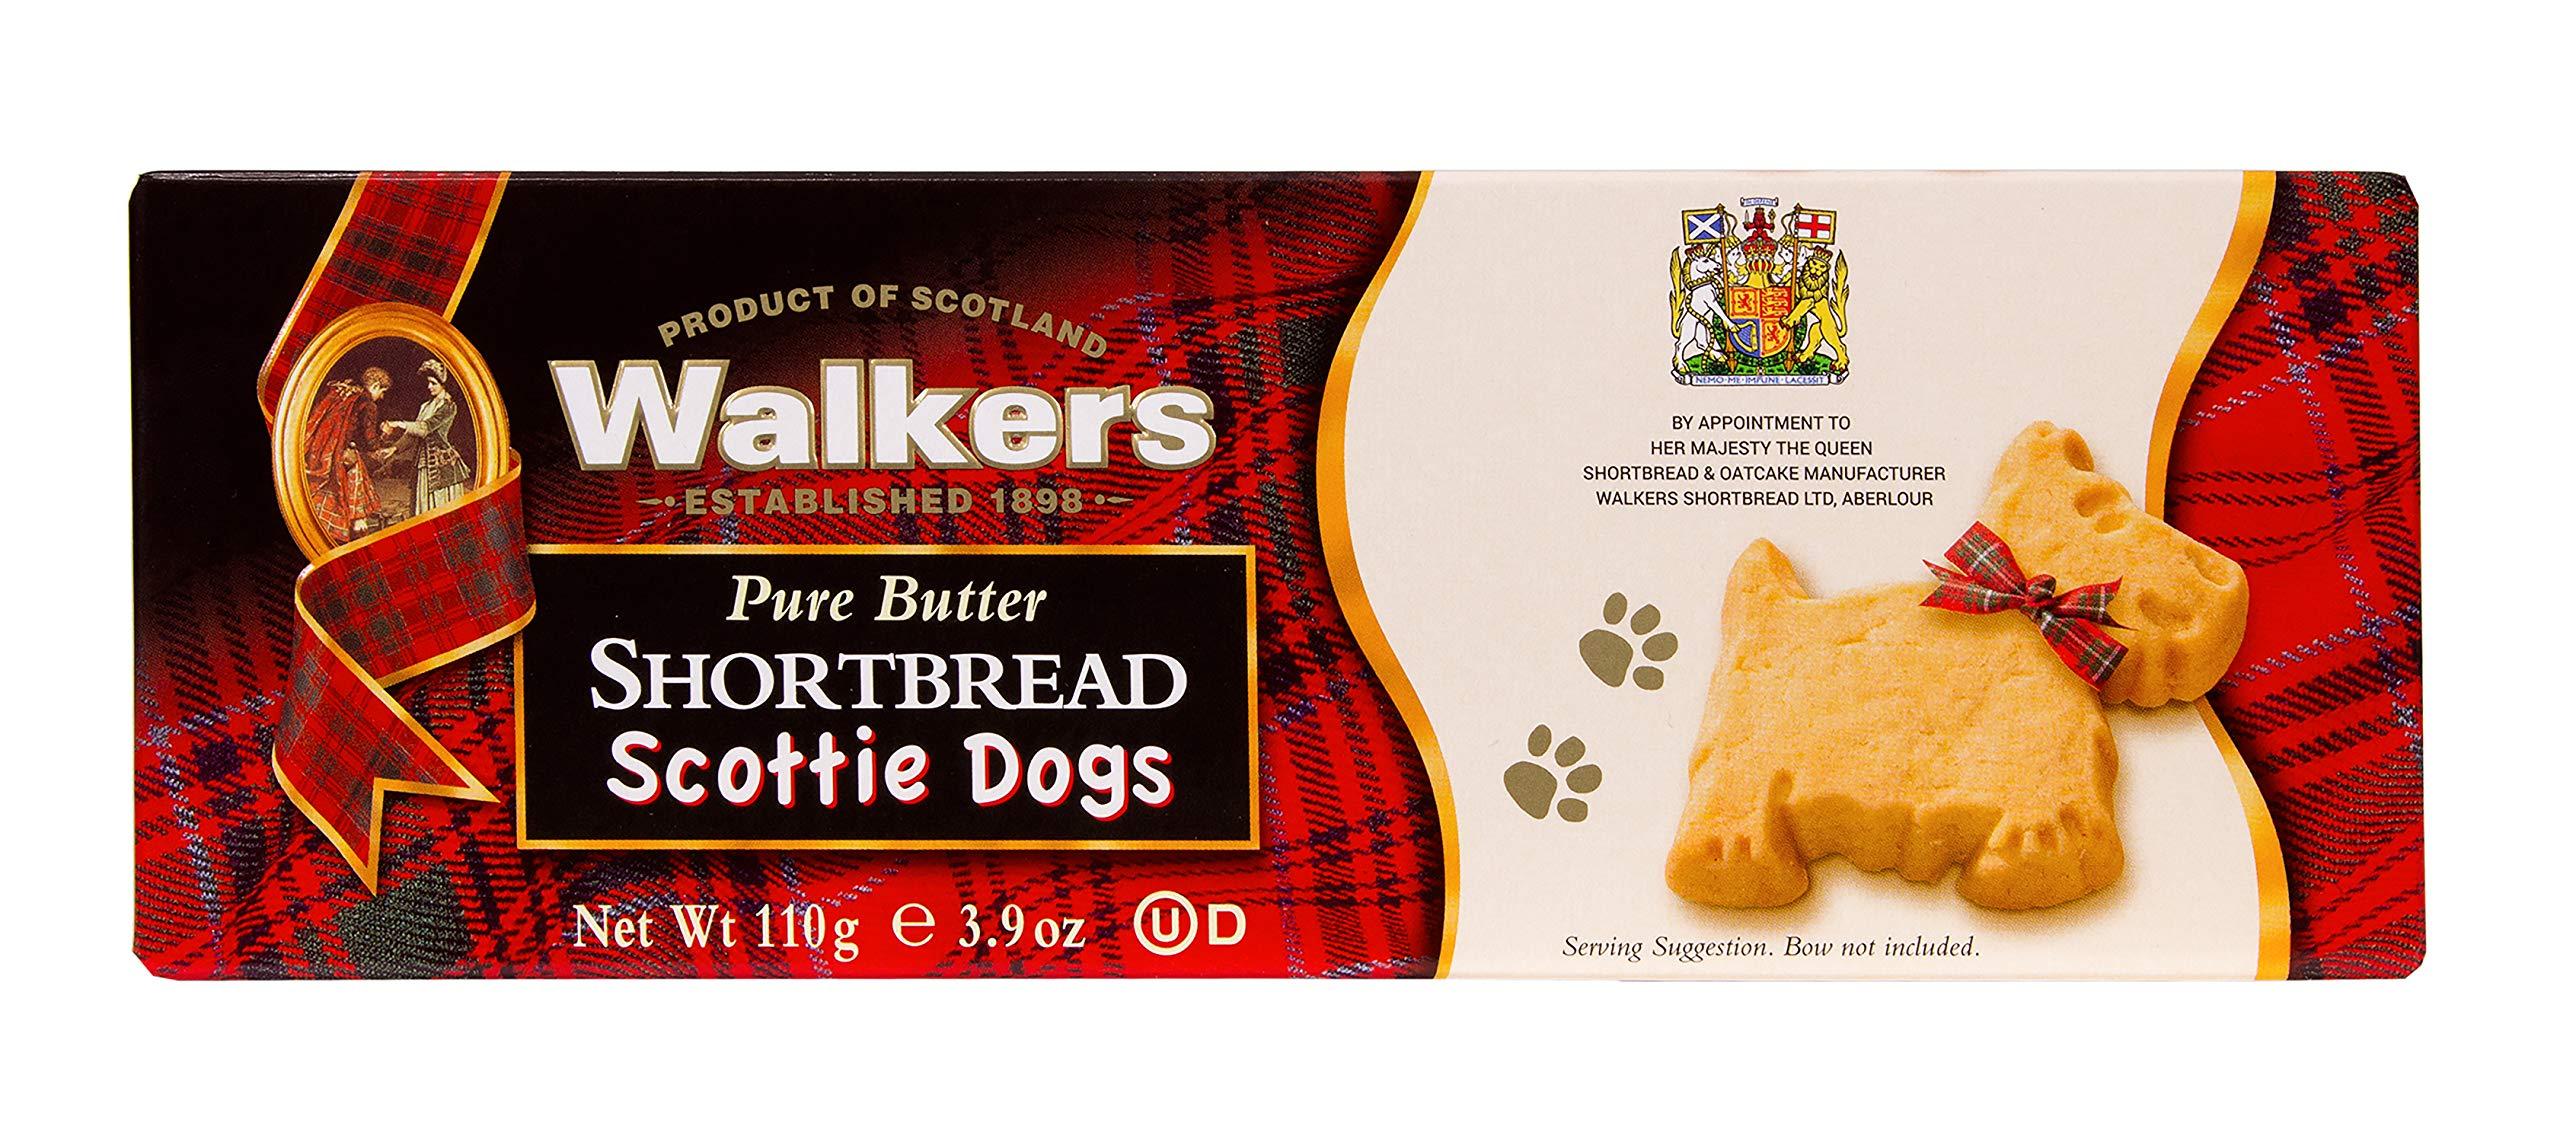 Walkers Shortbread Shortbread Scottie Dogs, 3.9-oz. (Count of 6)